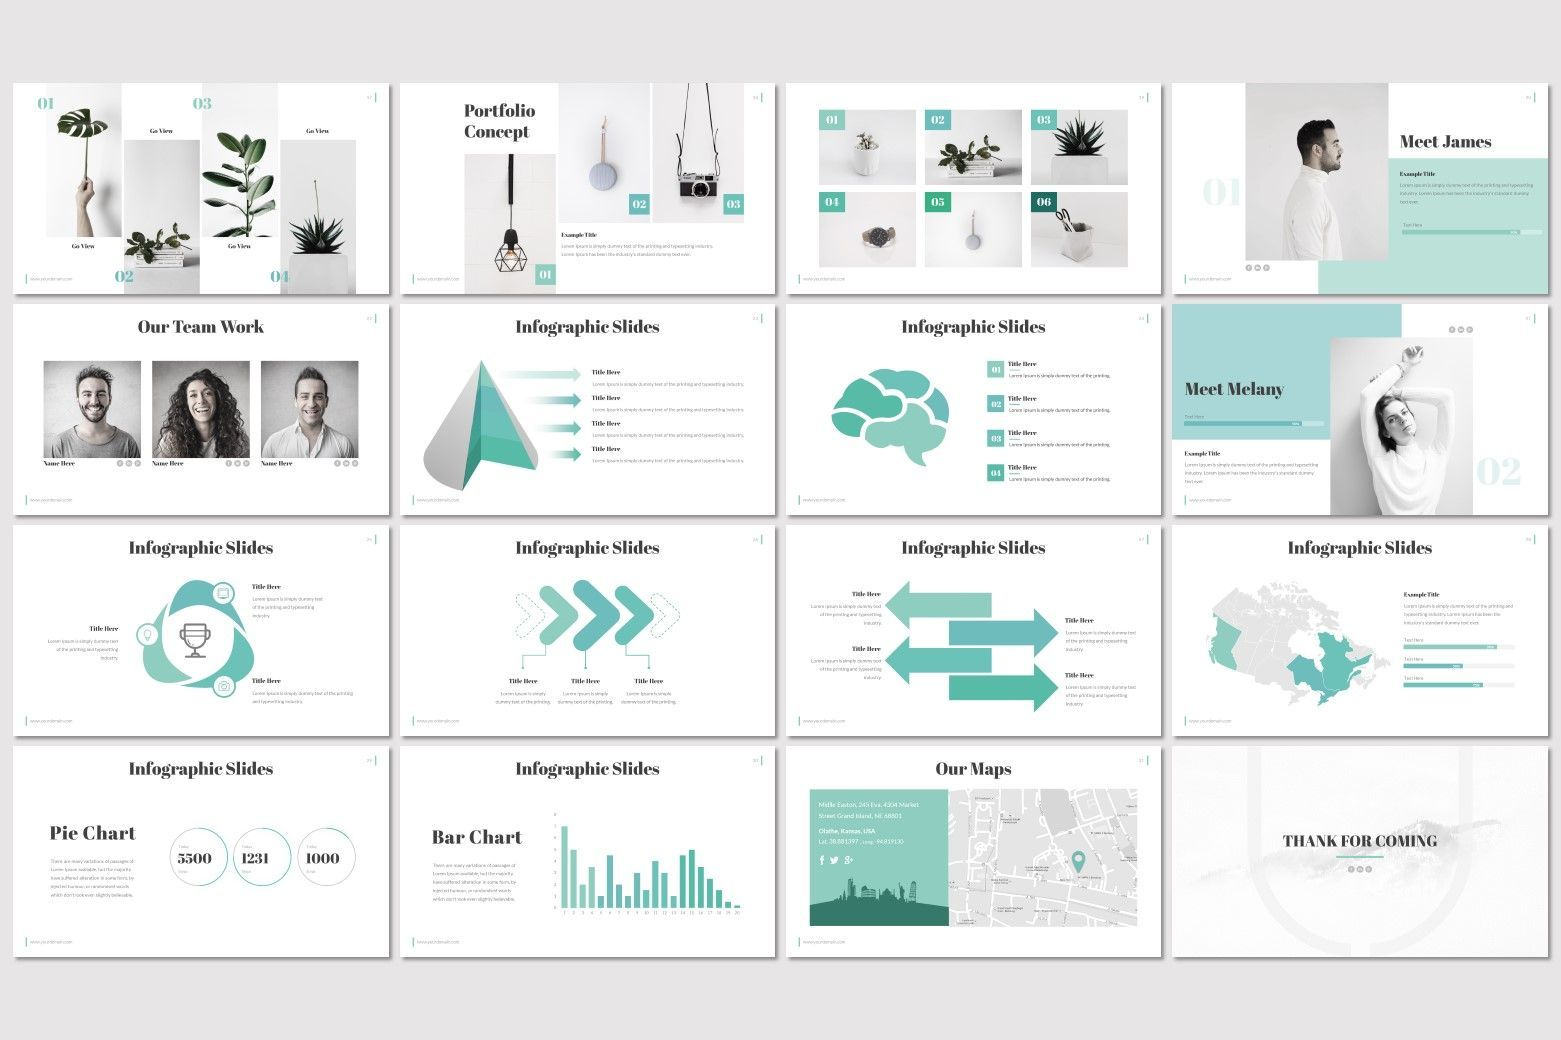 Lounge - PowerPoint Template, Slide 3, 07244, Presentation Templates — PoweredTemplate.com